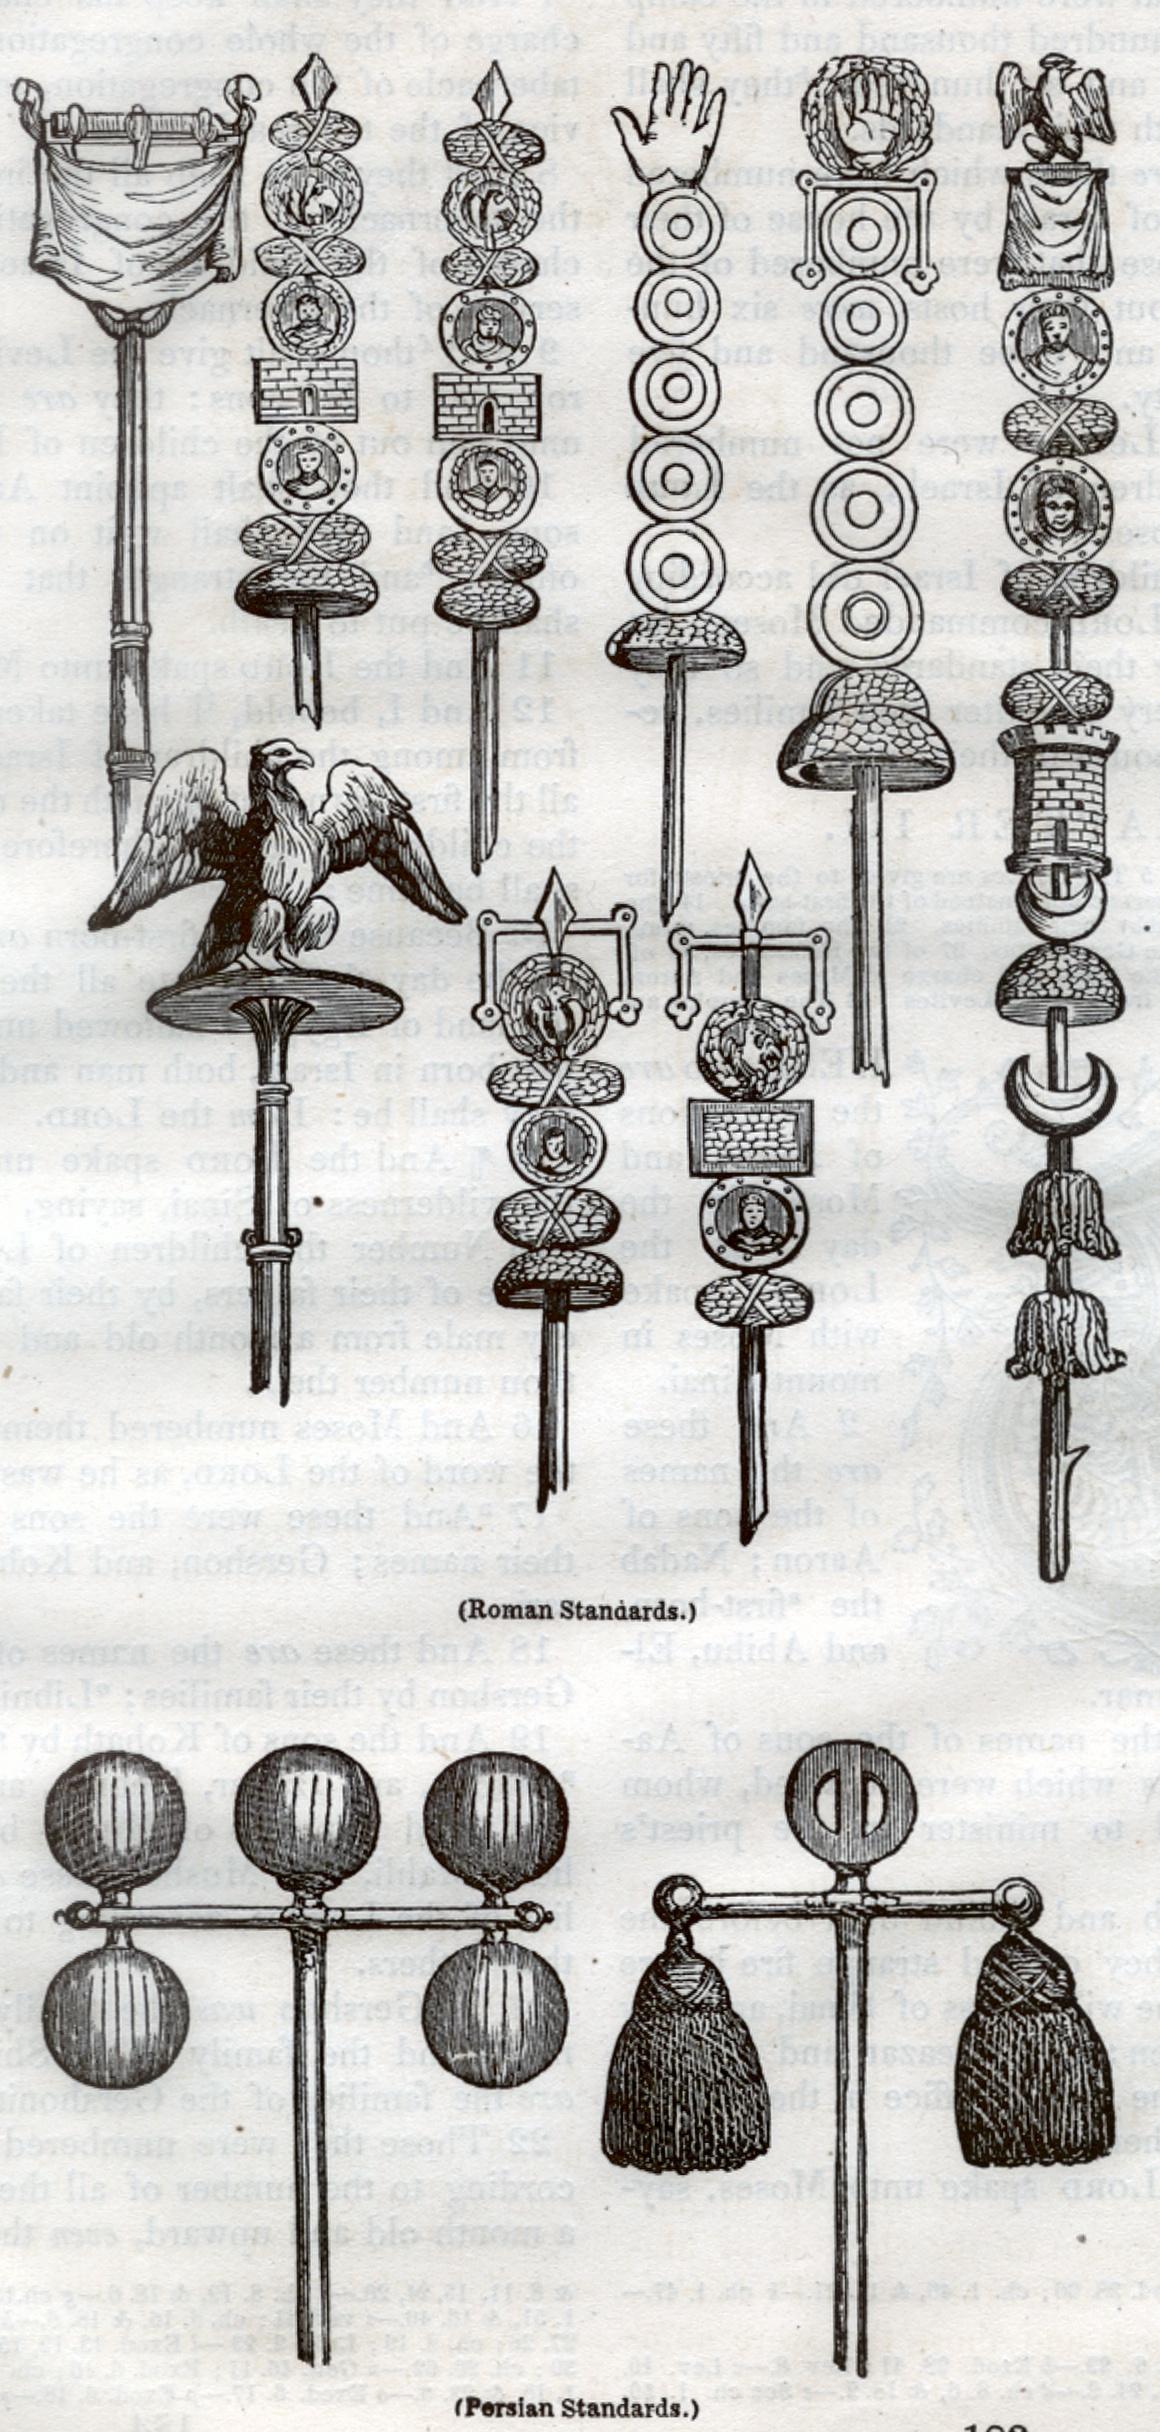 Roman Standards, Persian Standards